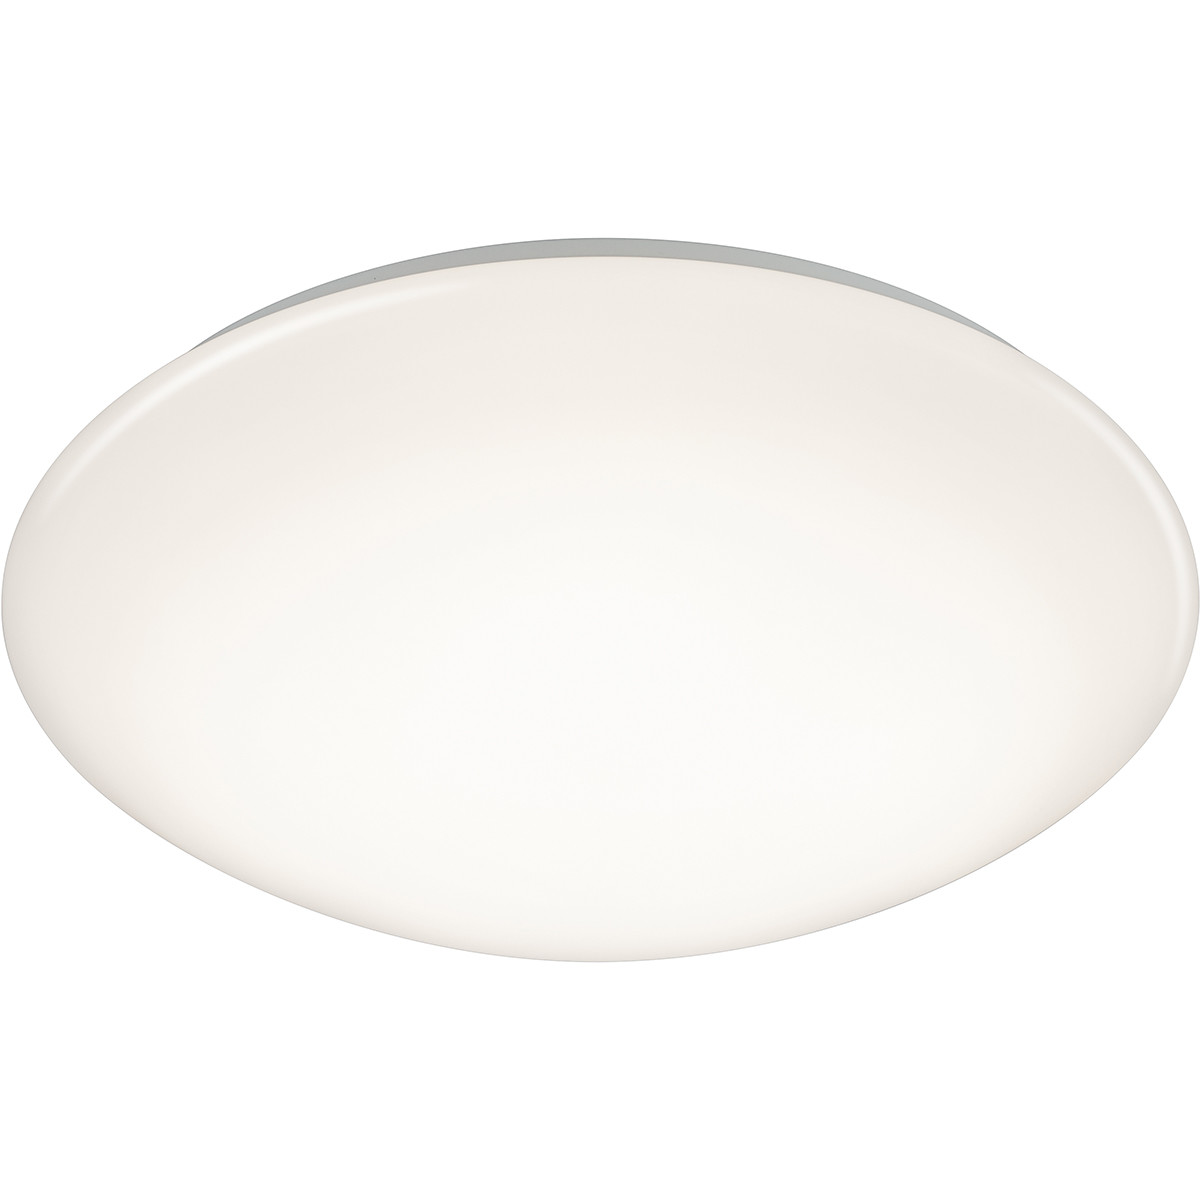 LED Plafondlamp - Trion Luka - 18W - Aanpasbare Kleur - Dimbaar - Afstandsbediening - Rond - Mat Wit